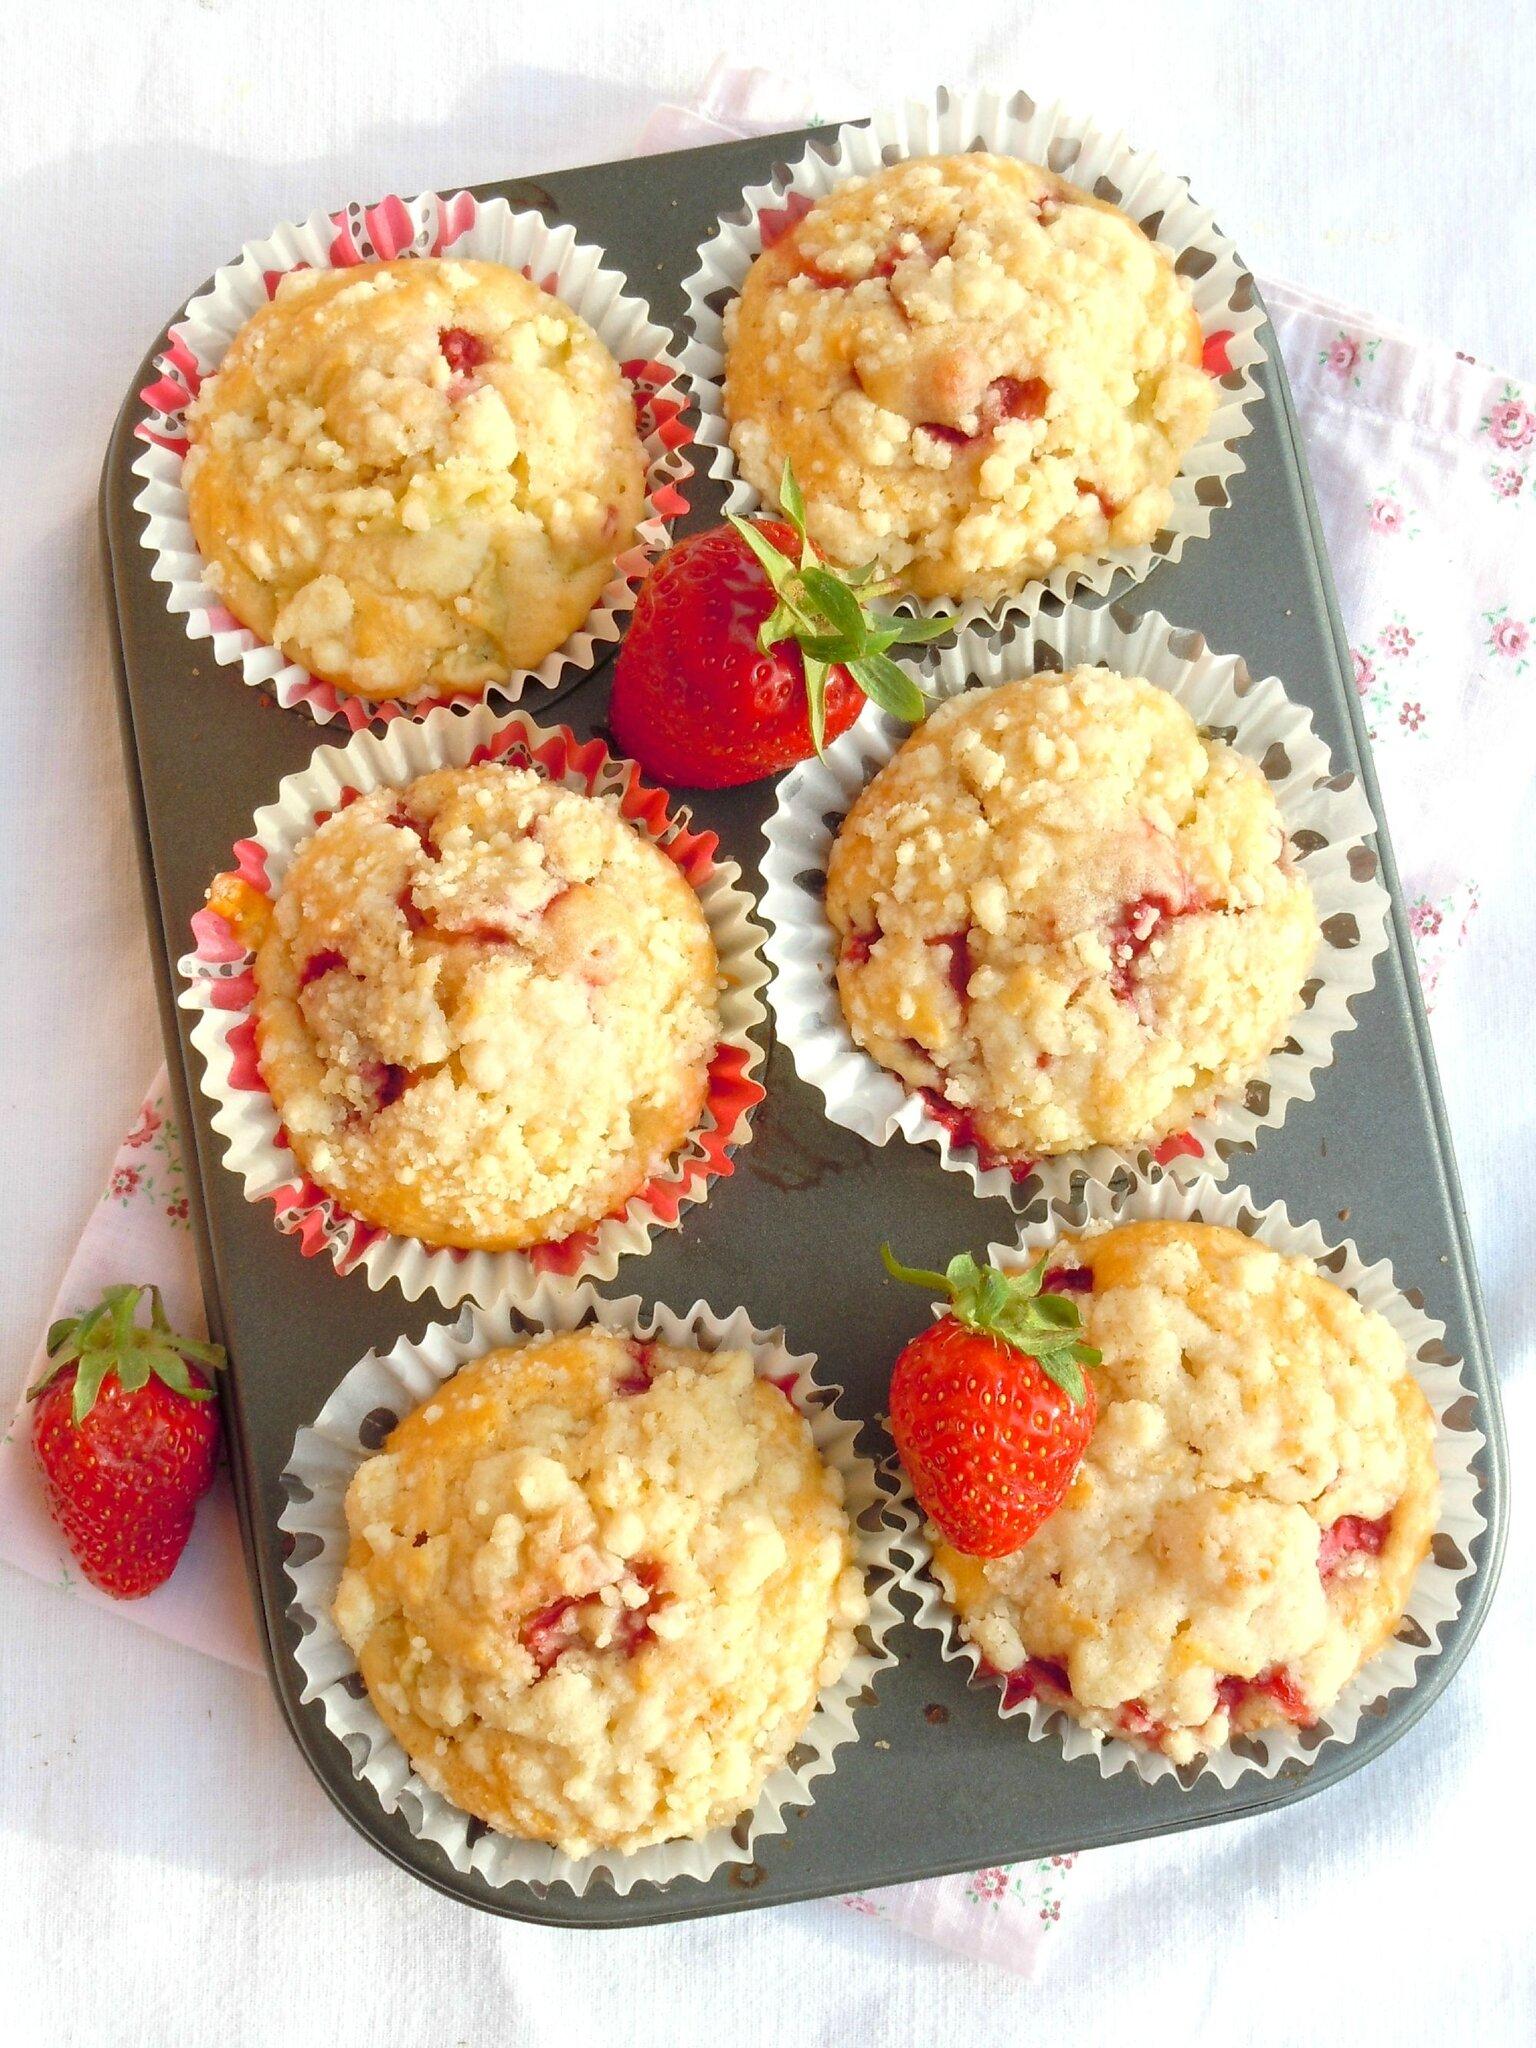 muffins fraises rhubarbe croustillants la gourmandise. Black Bedroom Furniture Sets. Home Design Ideas